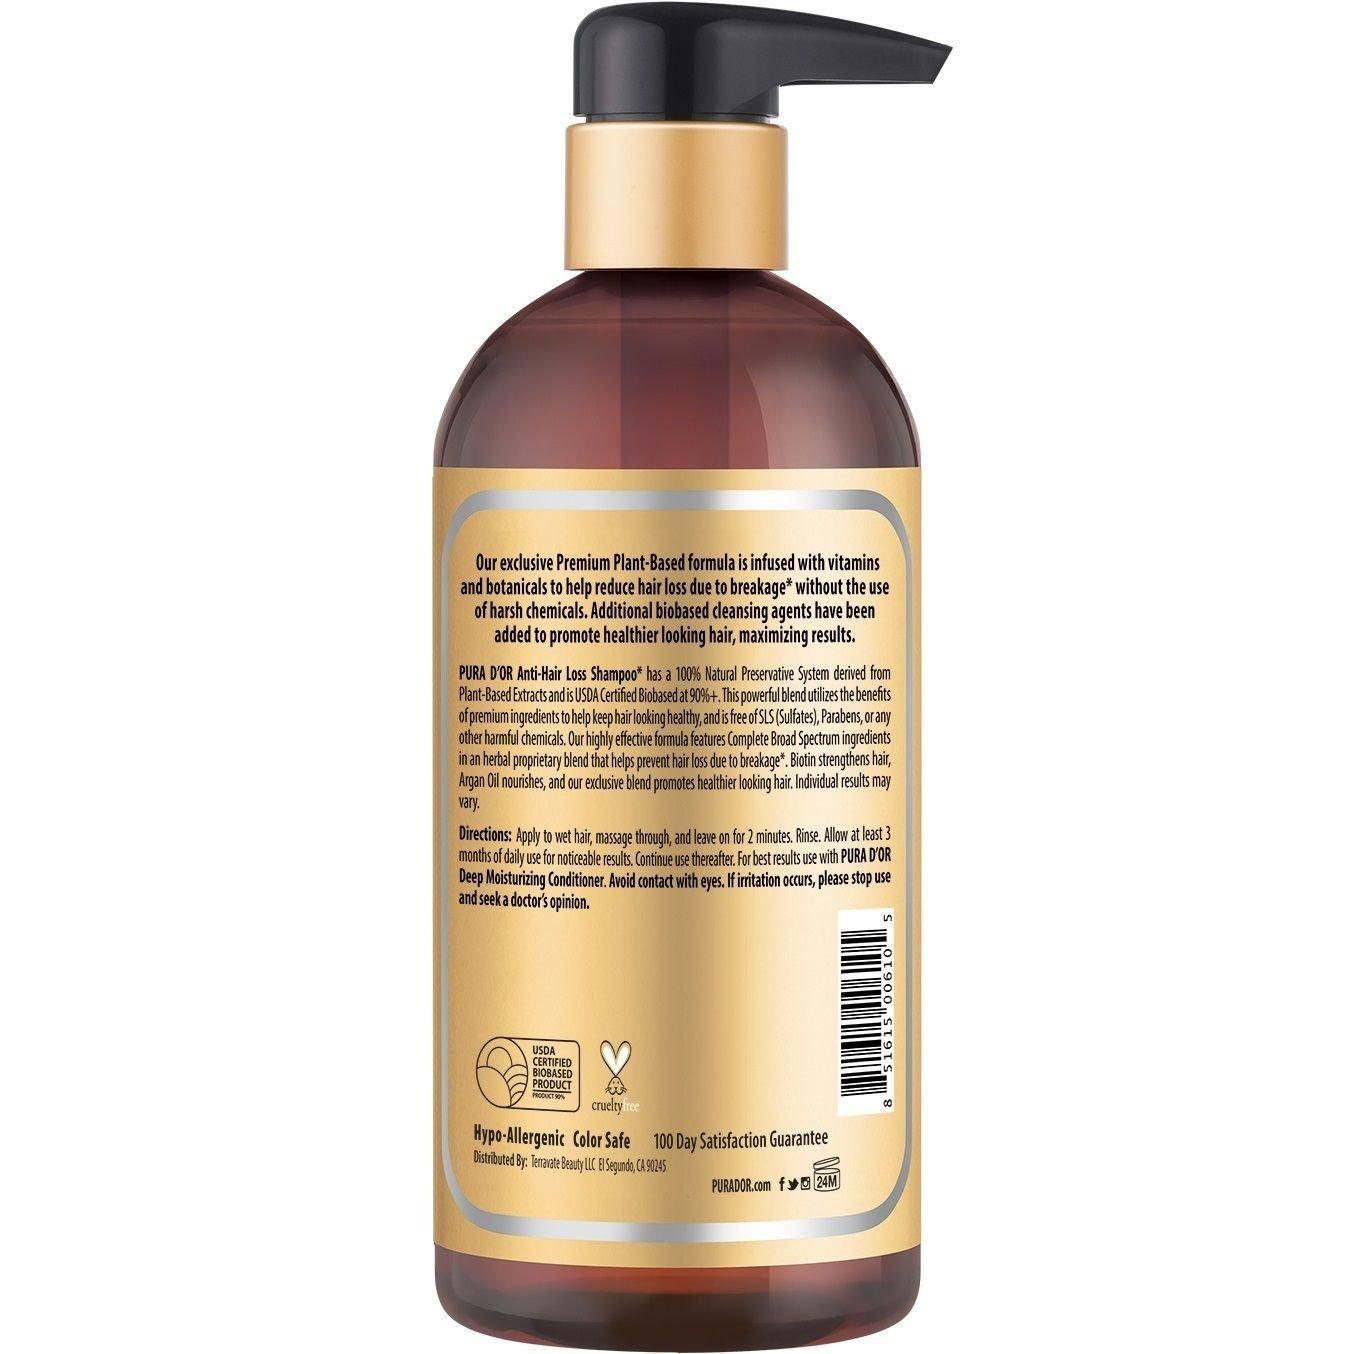 Amazon.com: Generic Anti-Hair Loss Argan Oil Shampoo Gold Label: Cell Phones & Accessories